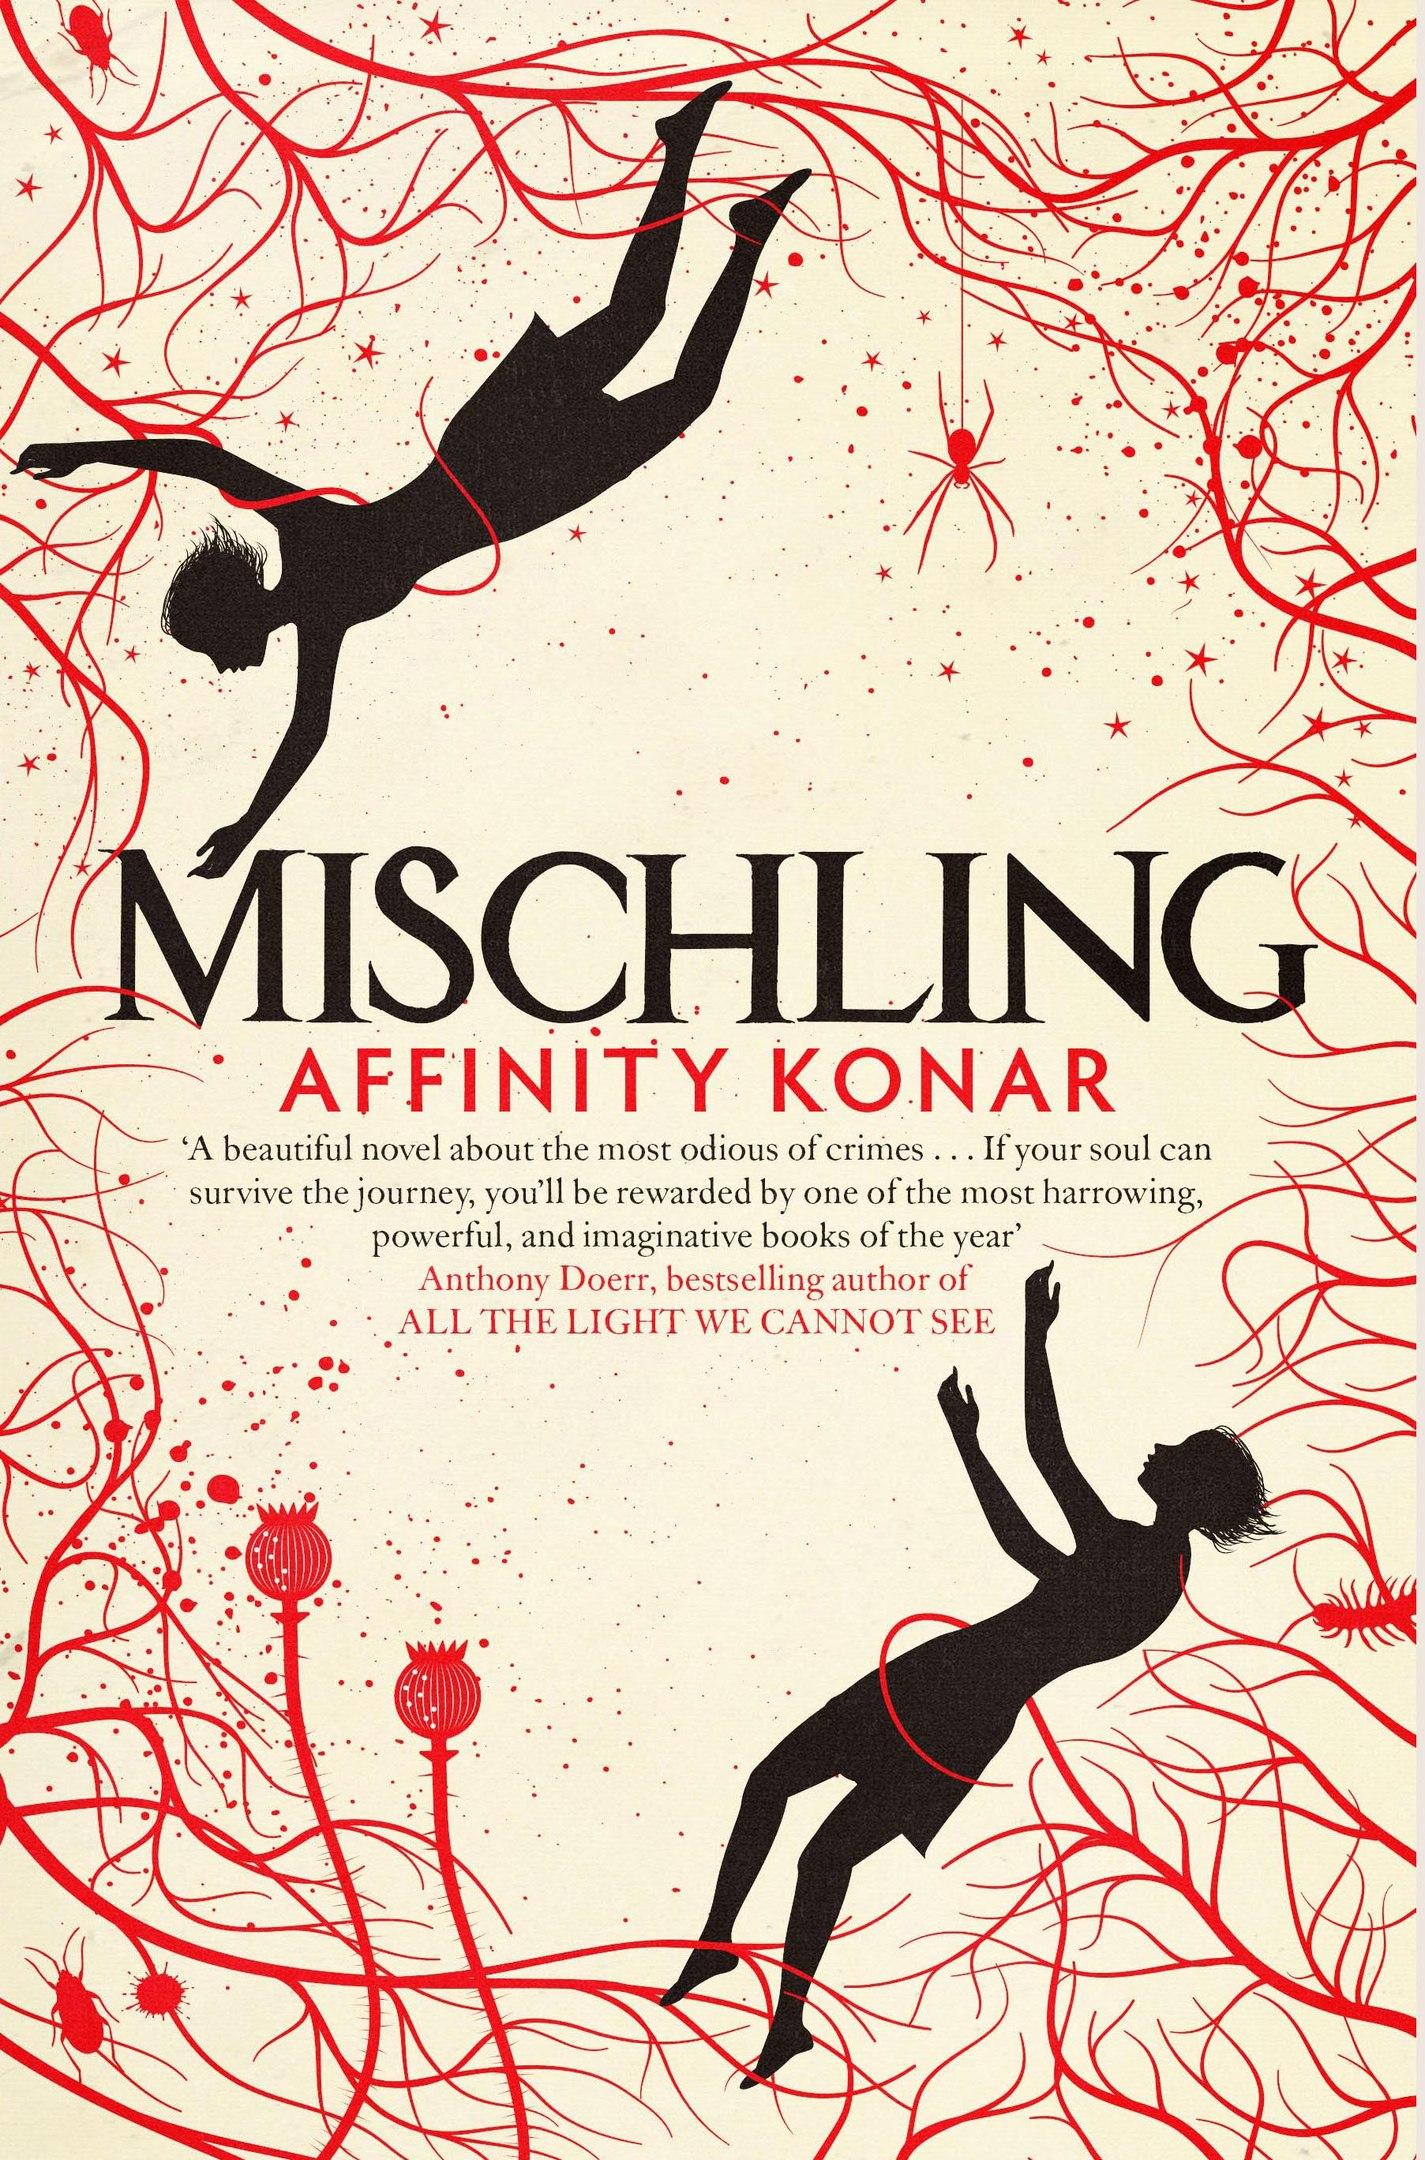 Affinity Konar – Mischling